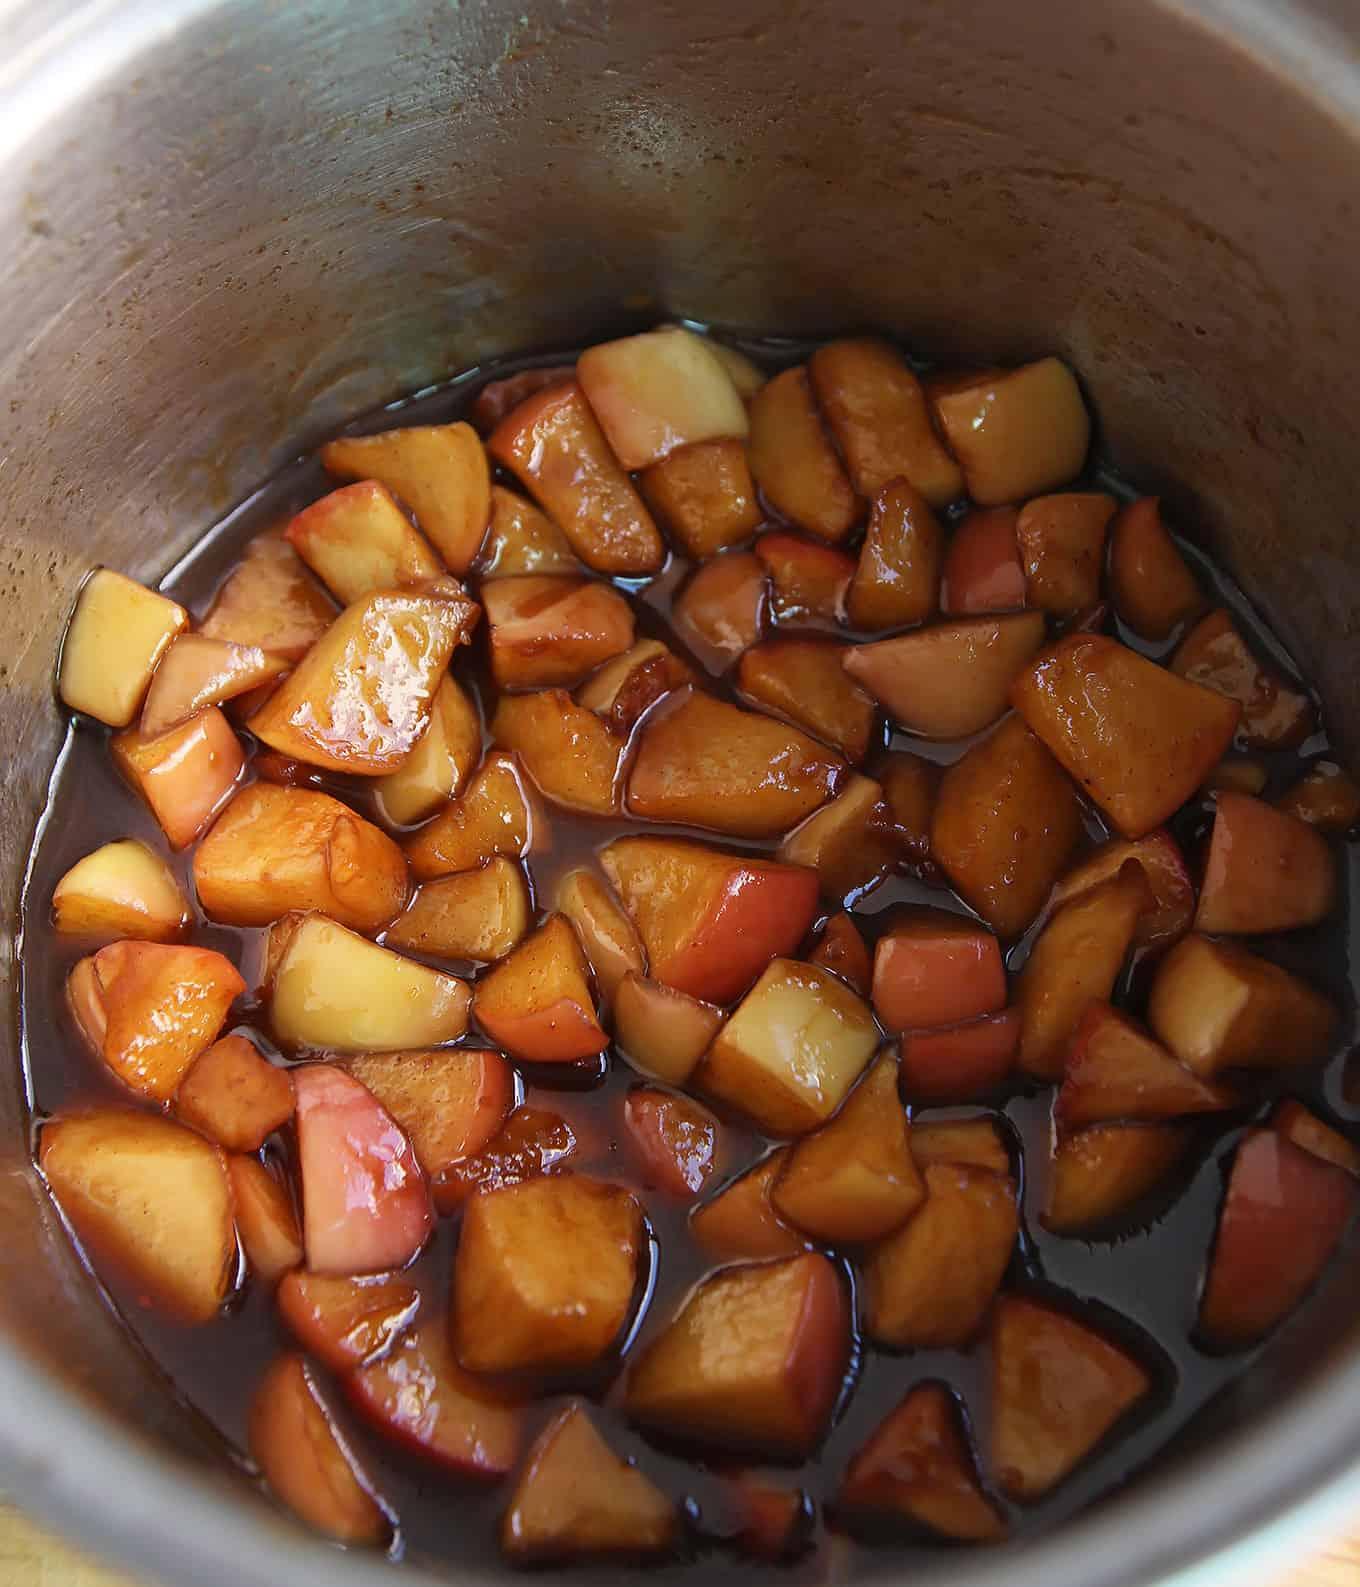 Apple Caramel Topping